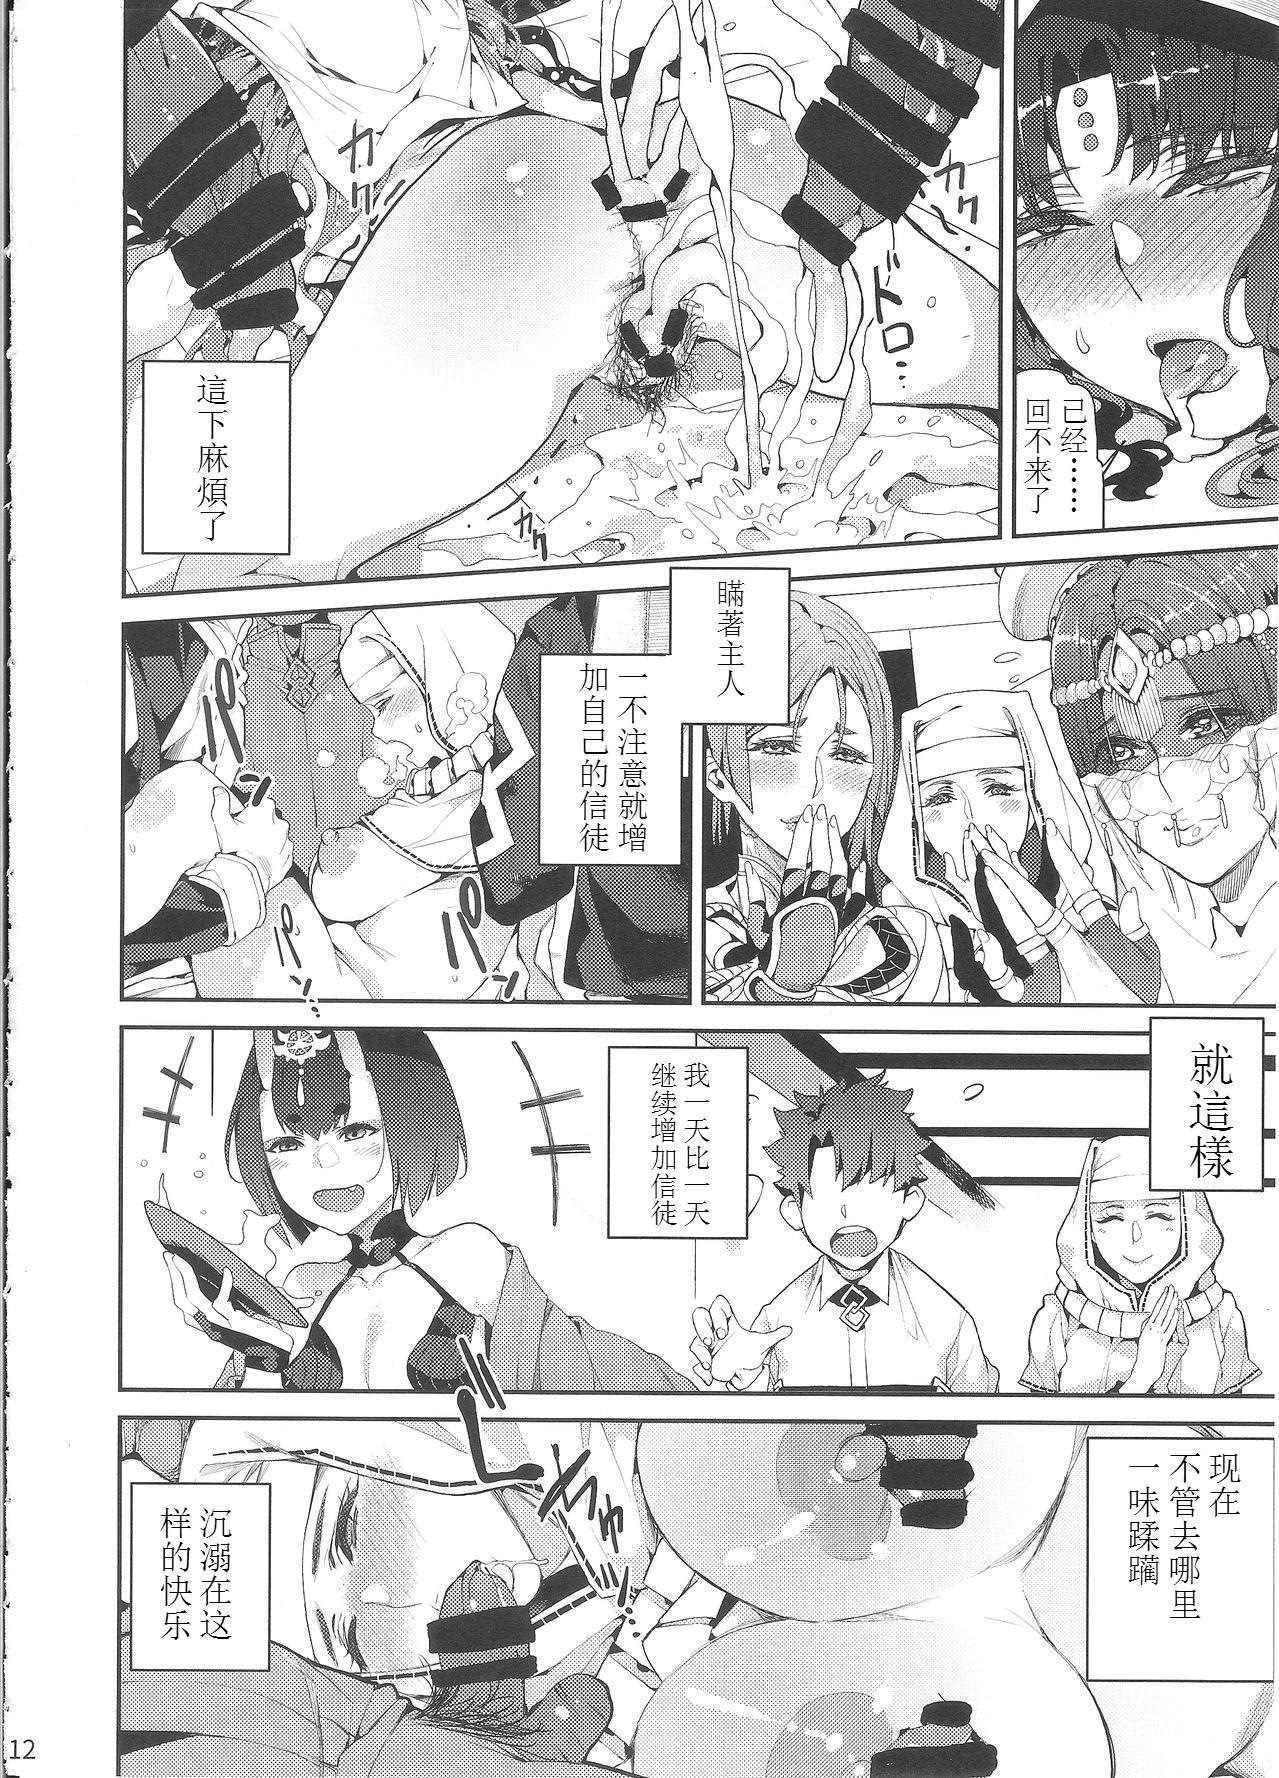 Mashou no Honnou 4